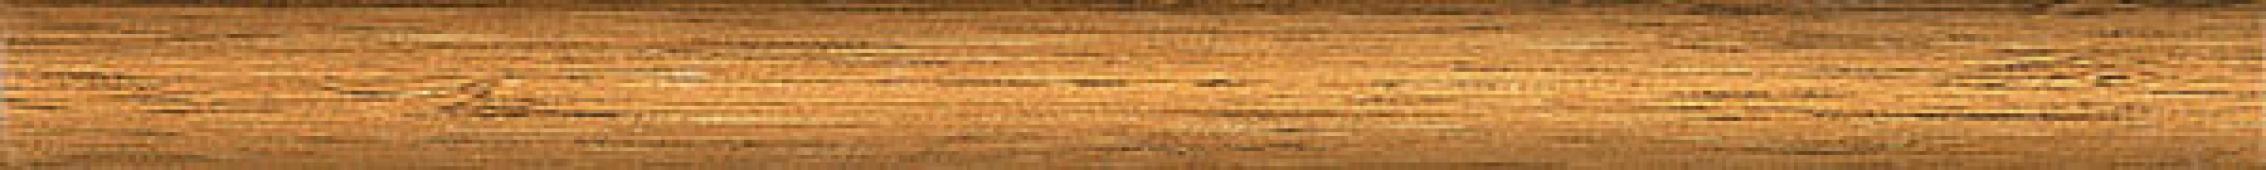 116 Карандаш Дерево бежевый матовый бордюр